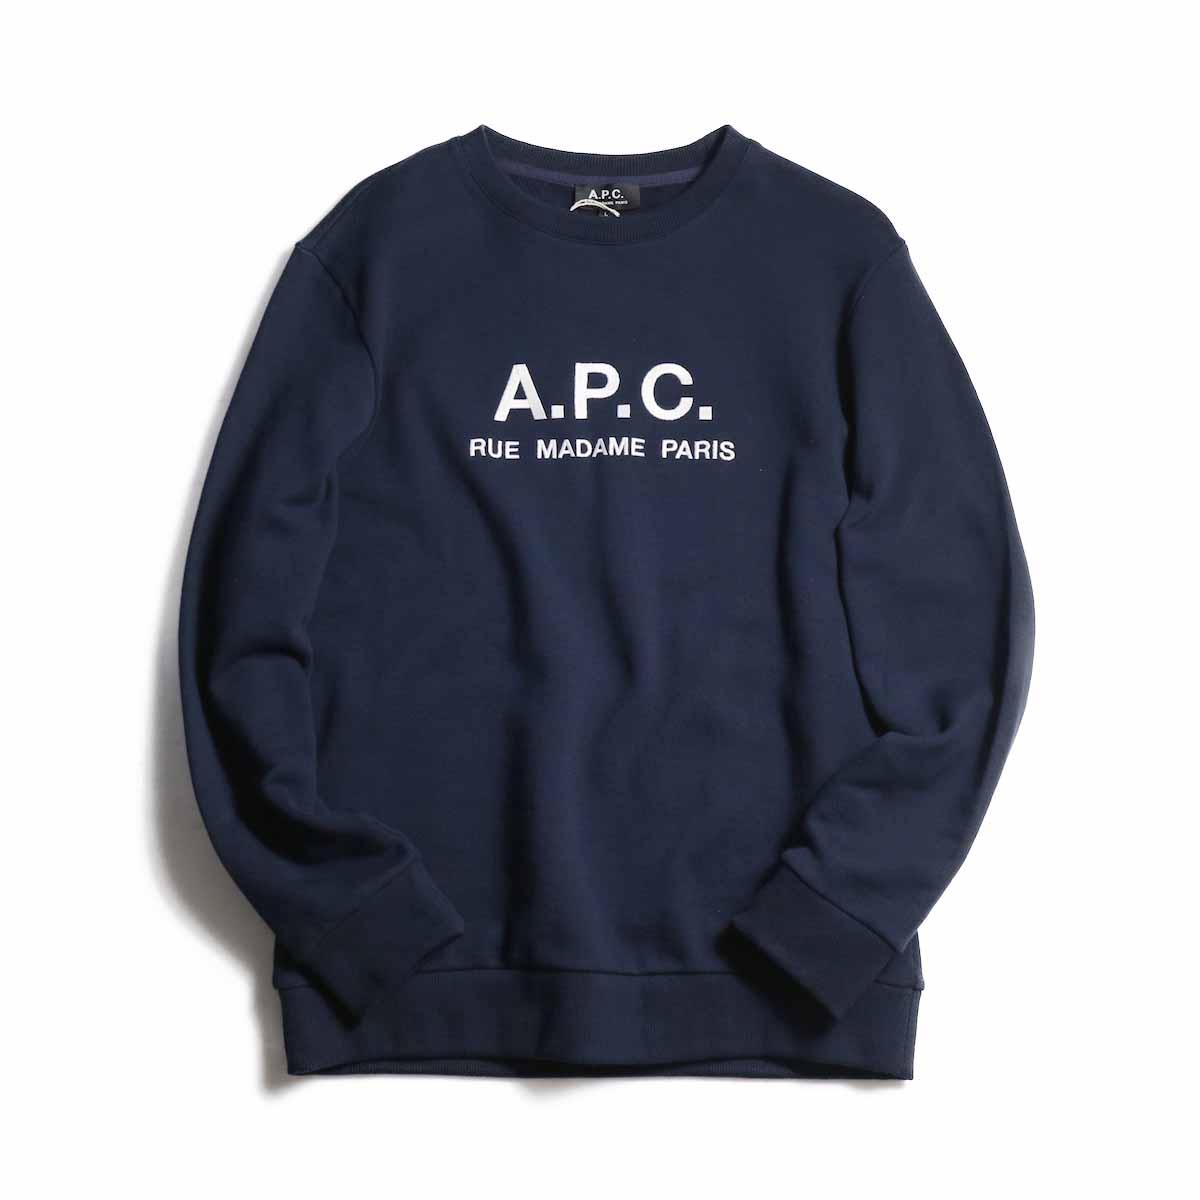 A.P.C. / Jeremie Sweat Shirt RUE MADAME PARIS -Navy